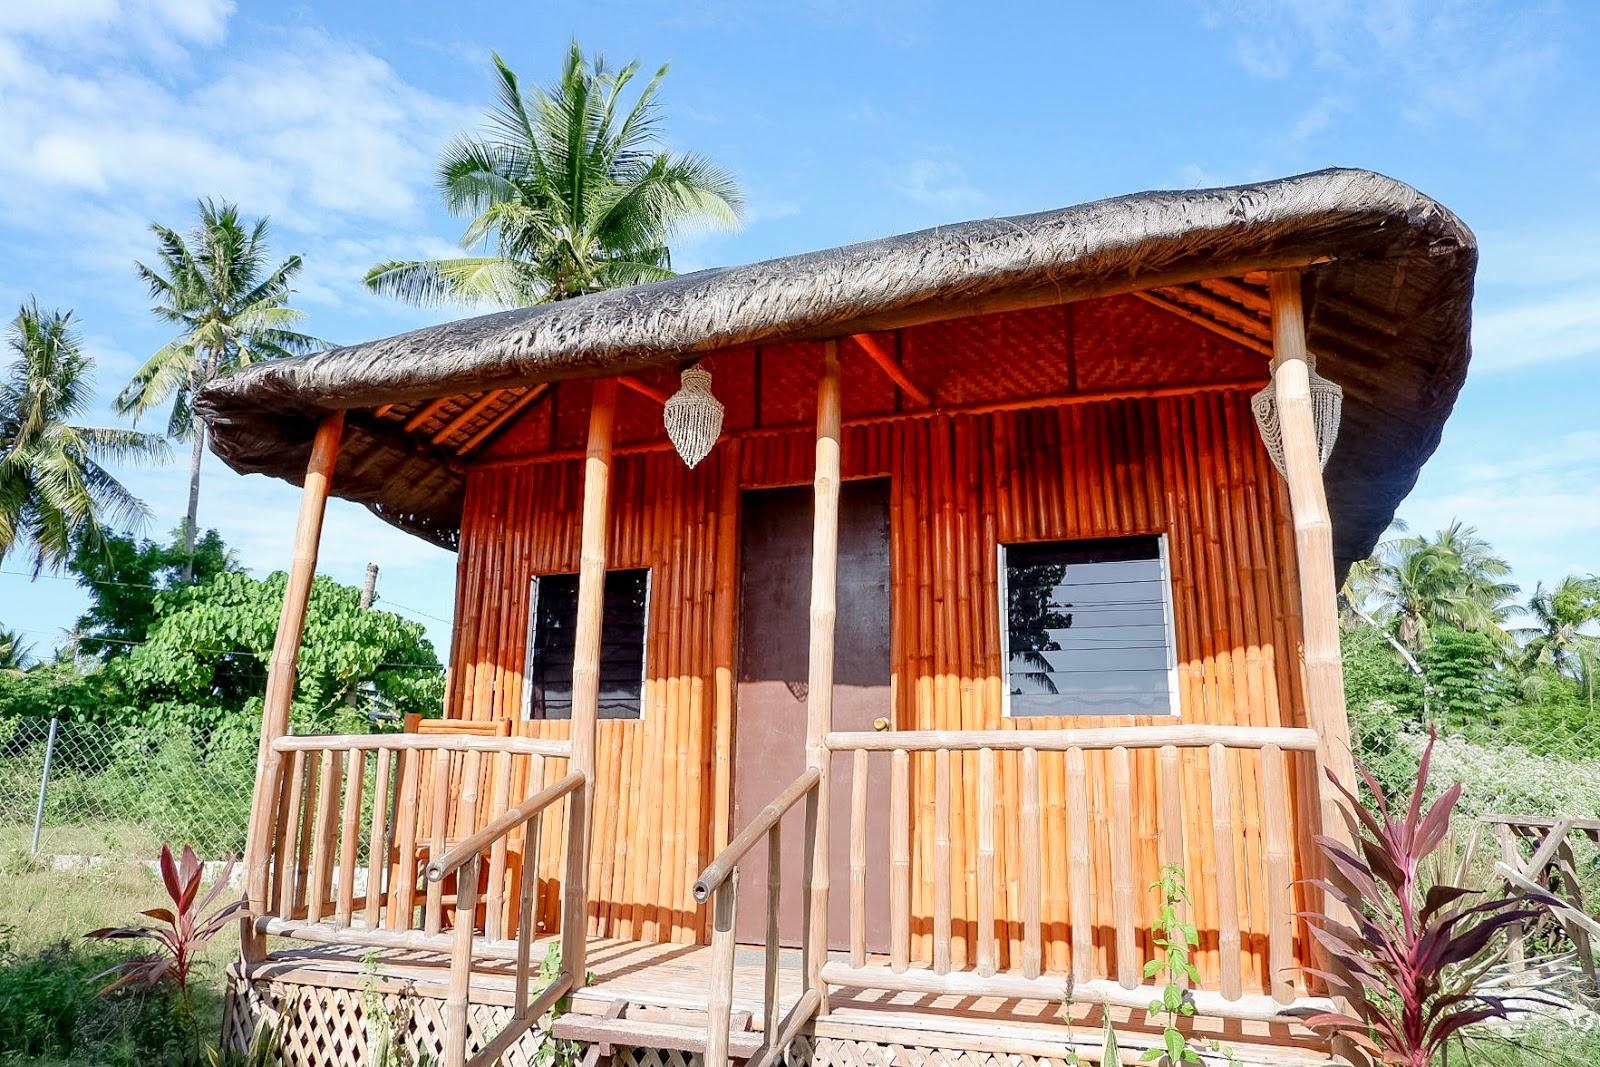 Ananets Hotel in Bantayan Island